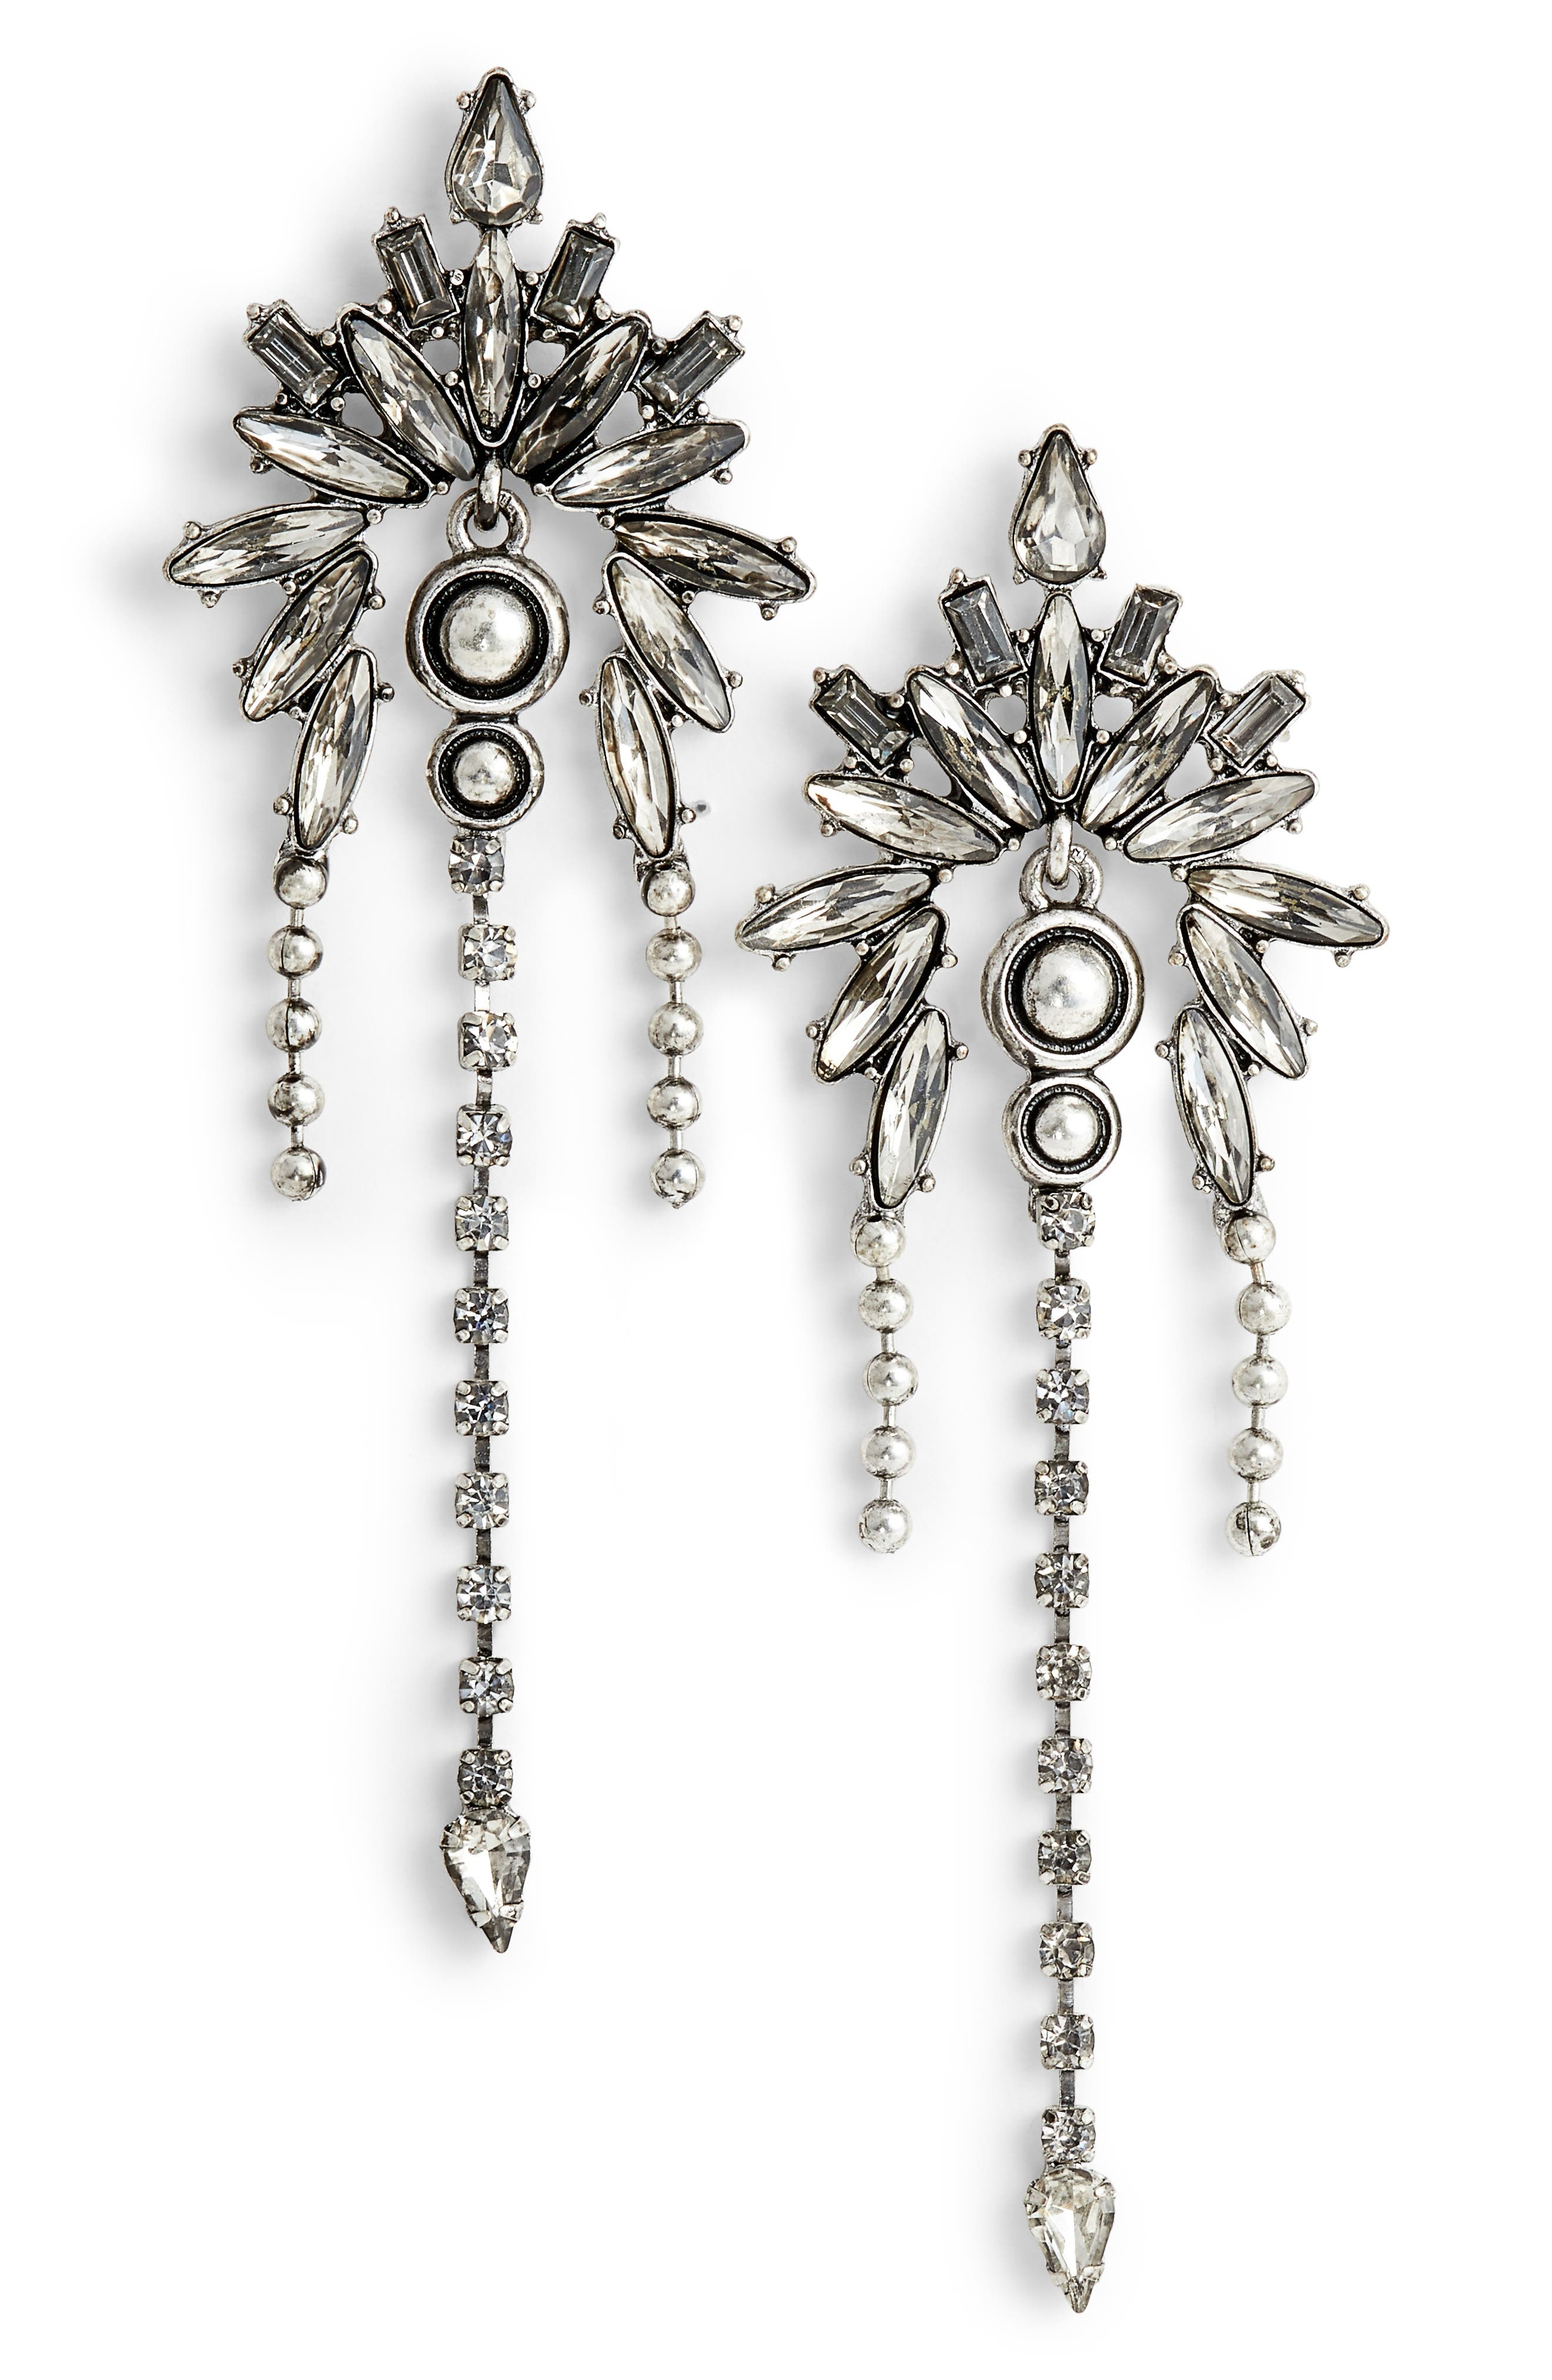 Crystal Chandelier Earrings,                             Main thumbnail 1, color,                             040